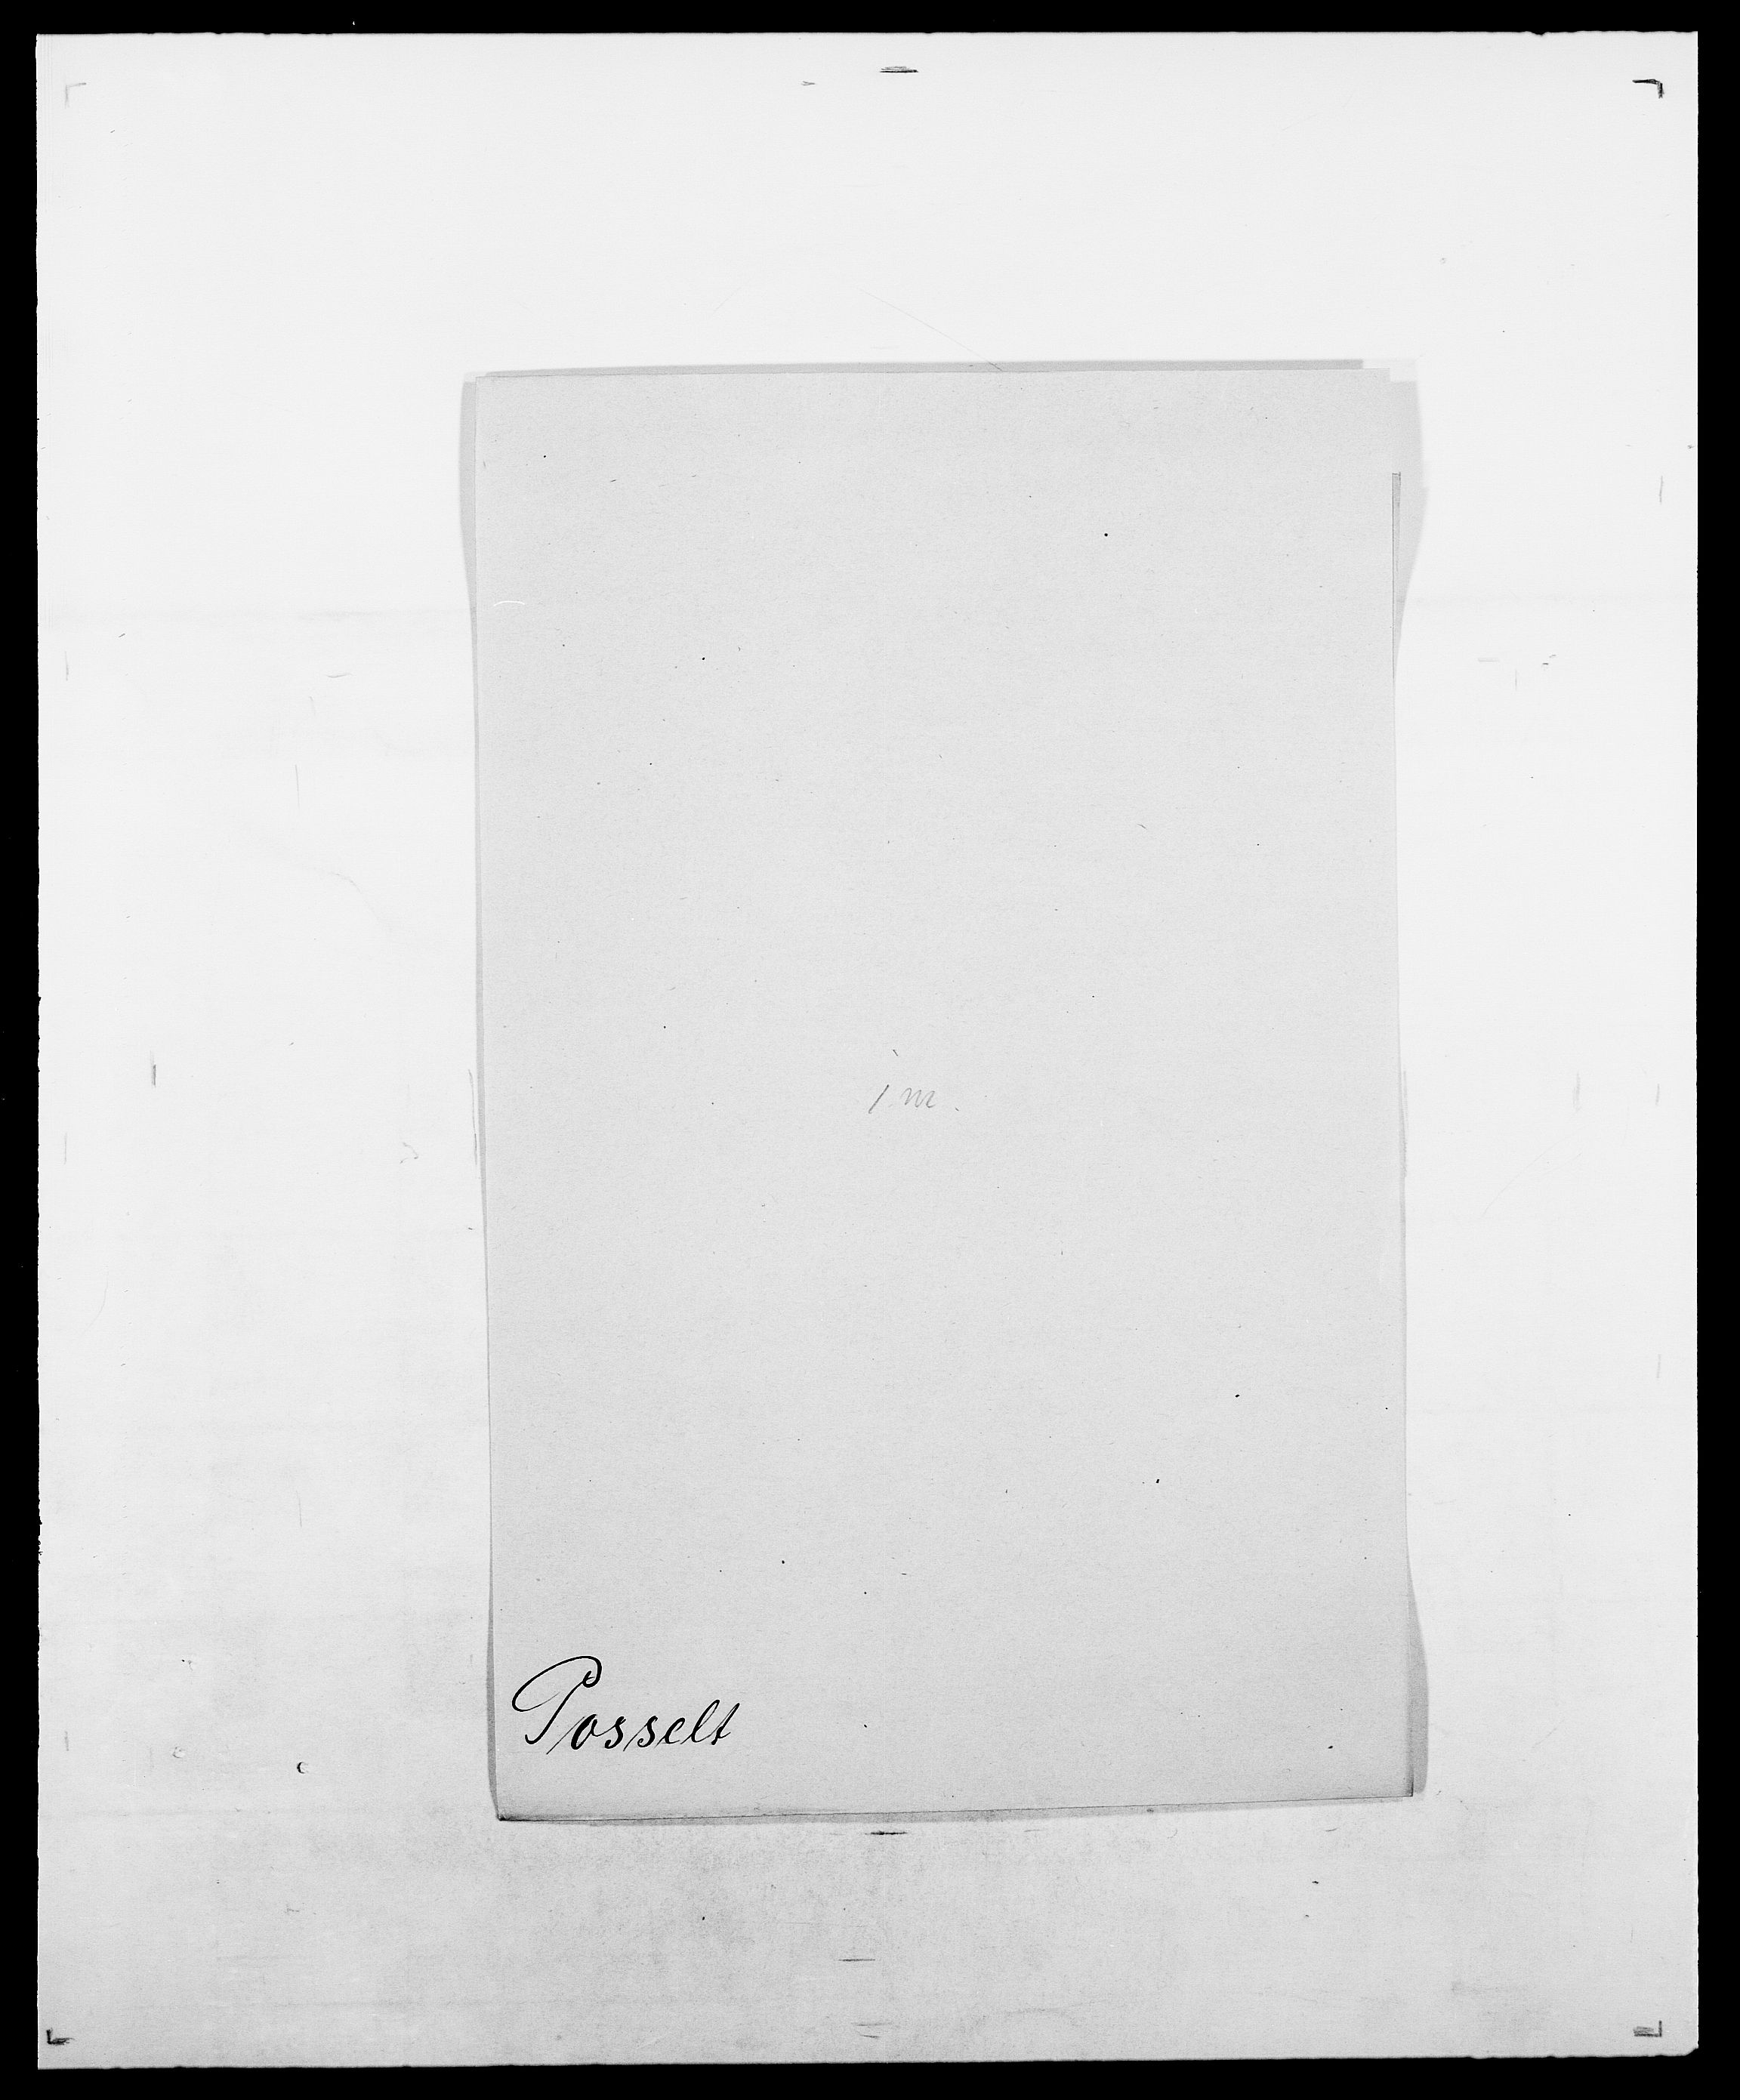 SAO, Delgobe, Charles Antoine - samling, D/Da/L0031: de Place - Raaum, s. 252